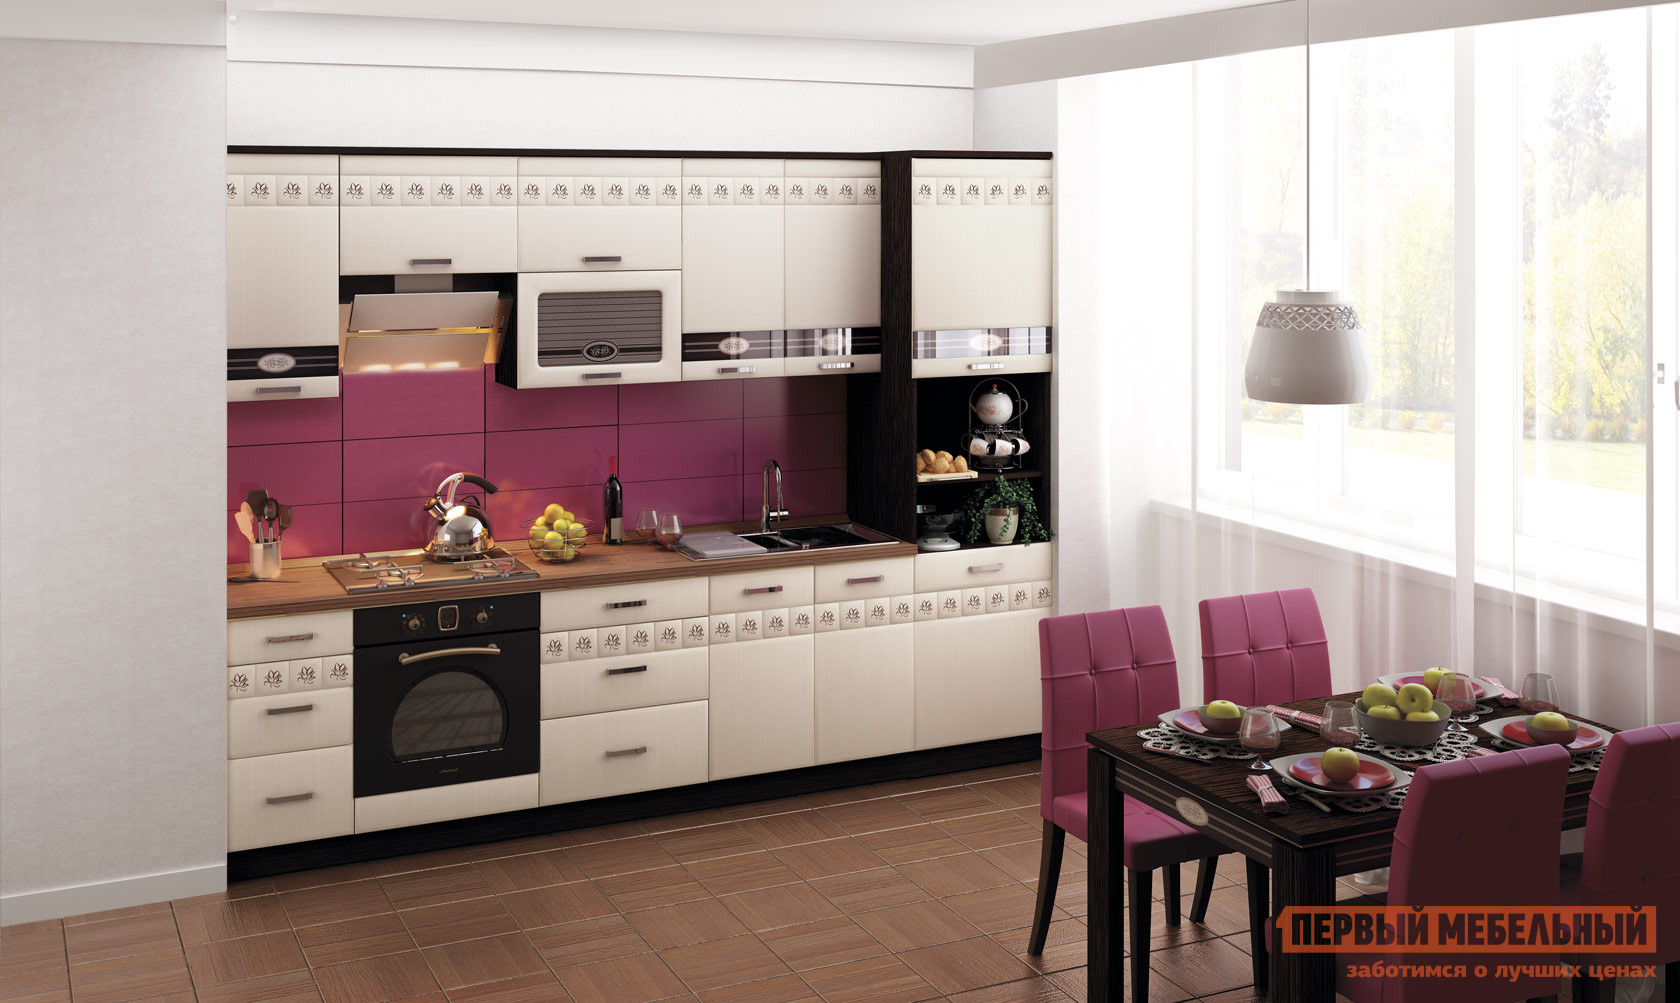 Кухонный гарнитур Витра Аврора 300-3 кухонный гарнитур витра глория 3 к2